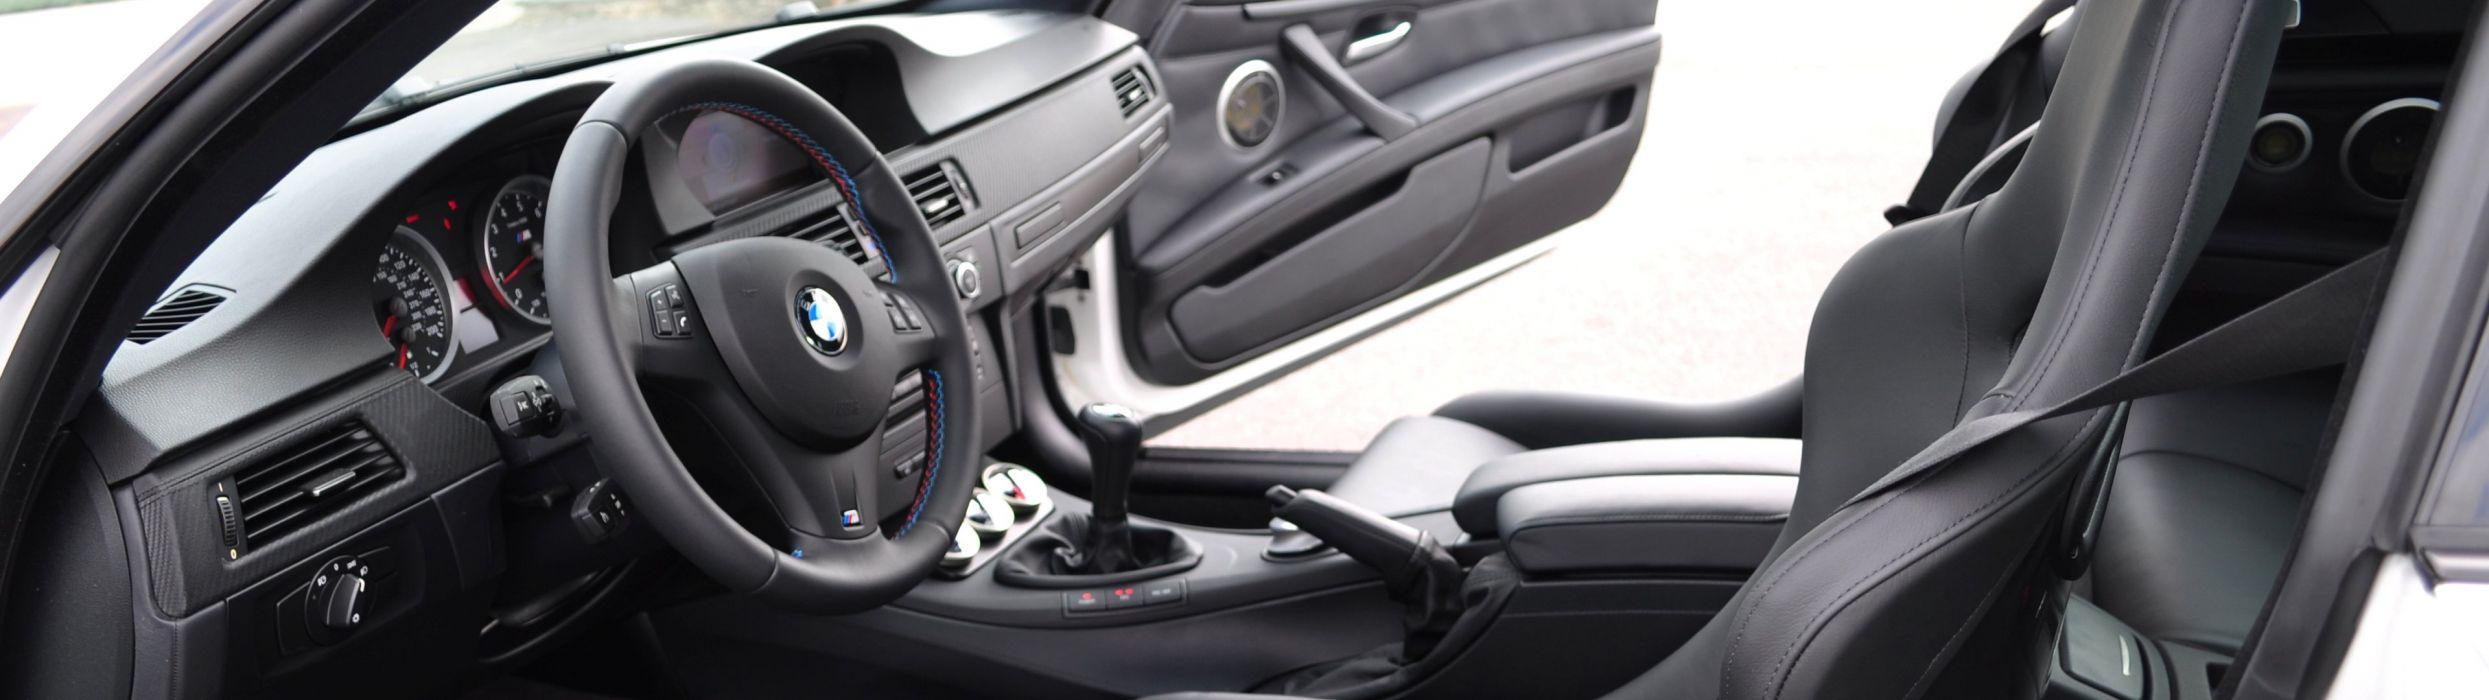 BMW car interiors BMW 1 series M Coupe wallpaper